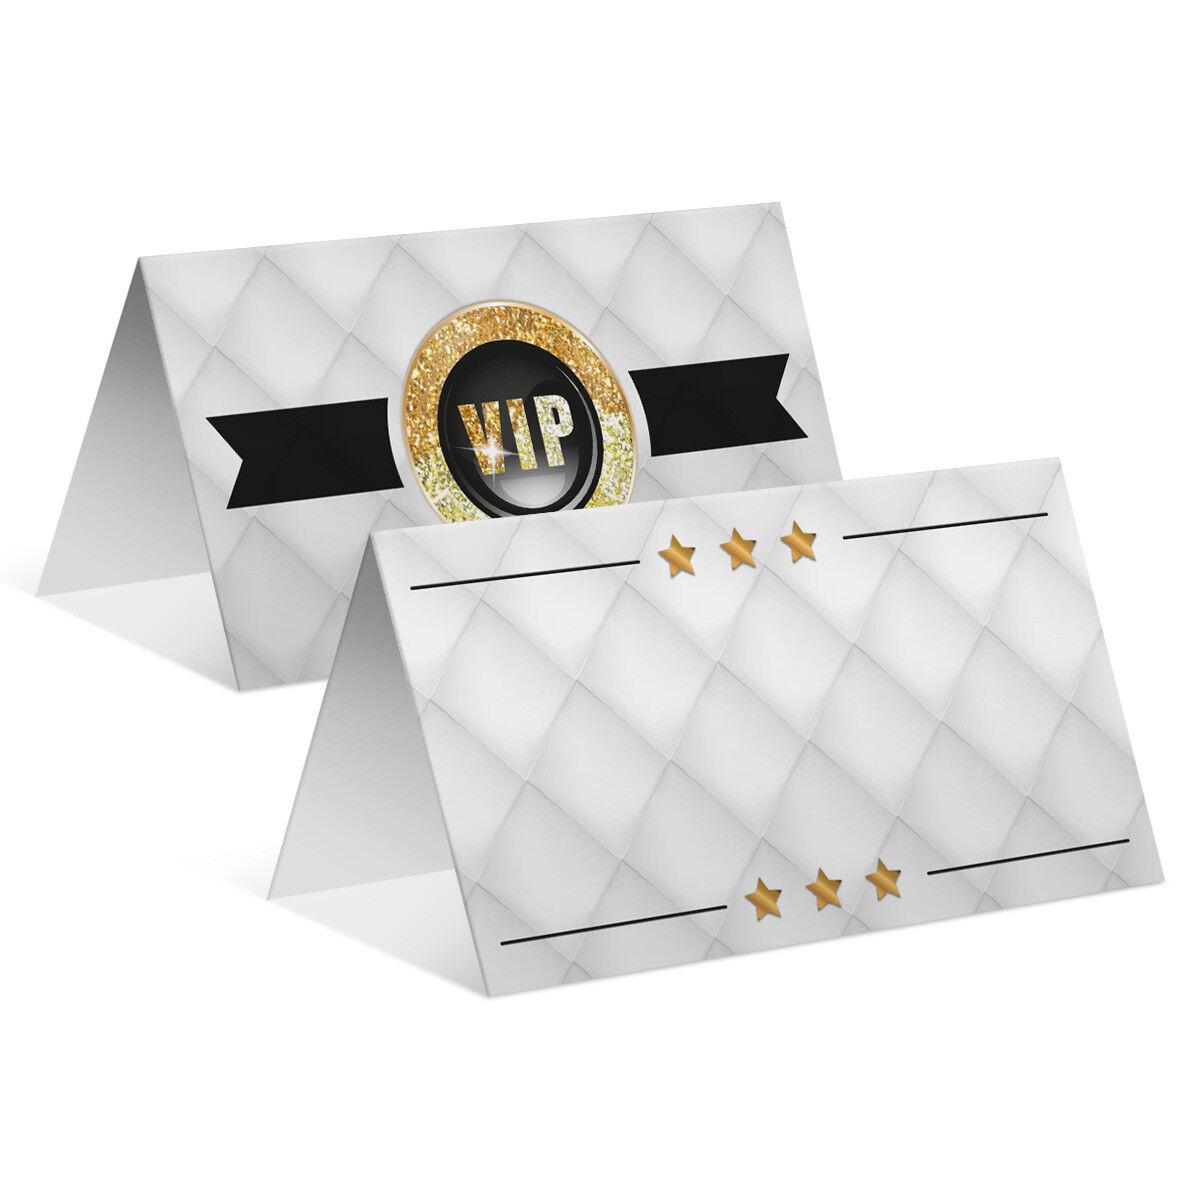 Blanko Platzkarten Namenskarten Tischkarten Geburtstag Hochzeit - VIP Gold | Perfekt In Verarbeitung  | Sonderpreis